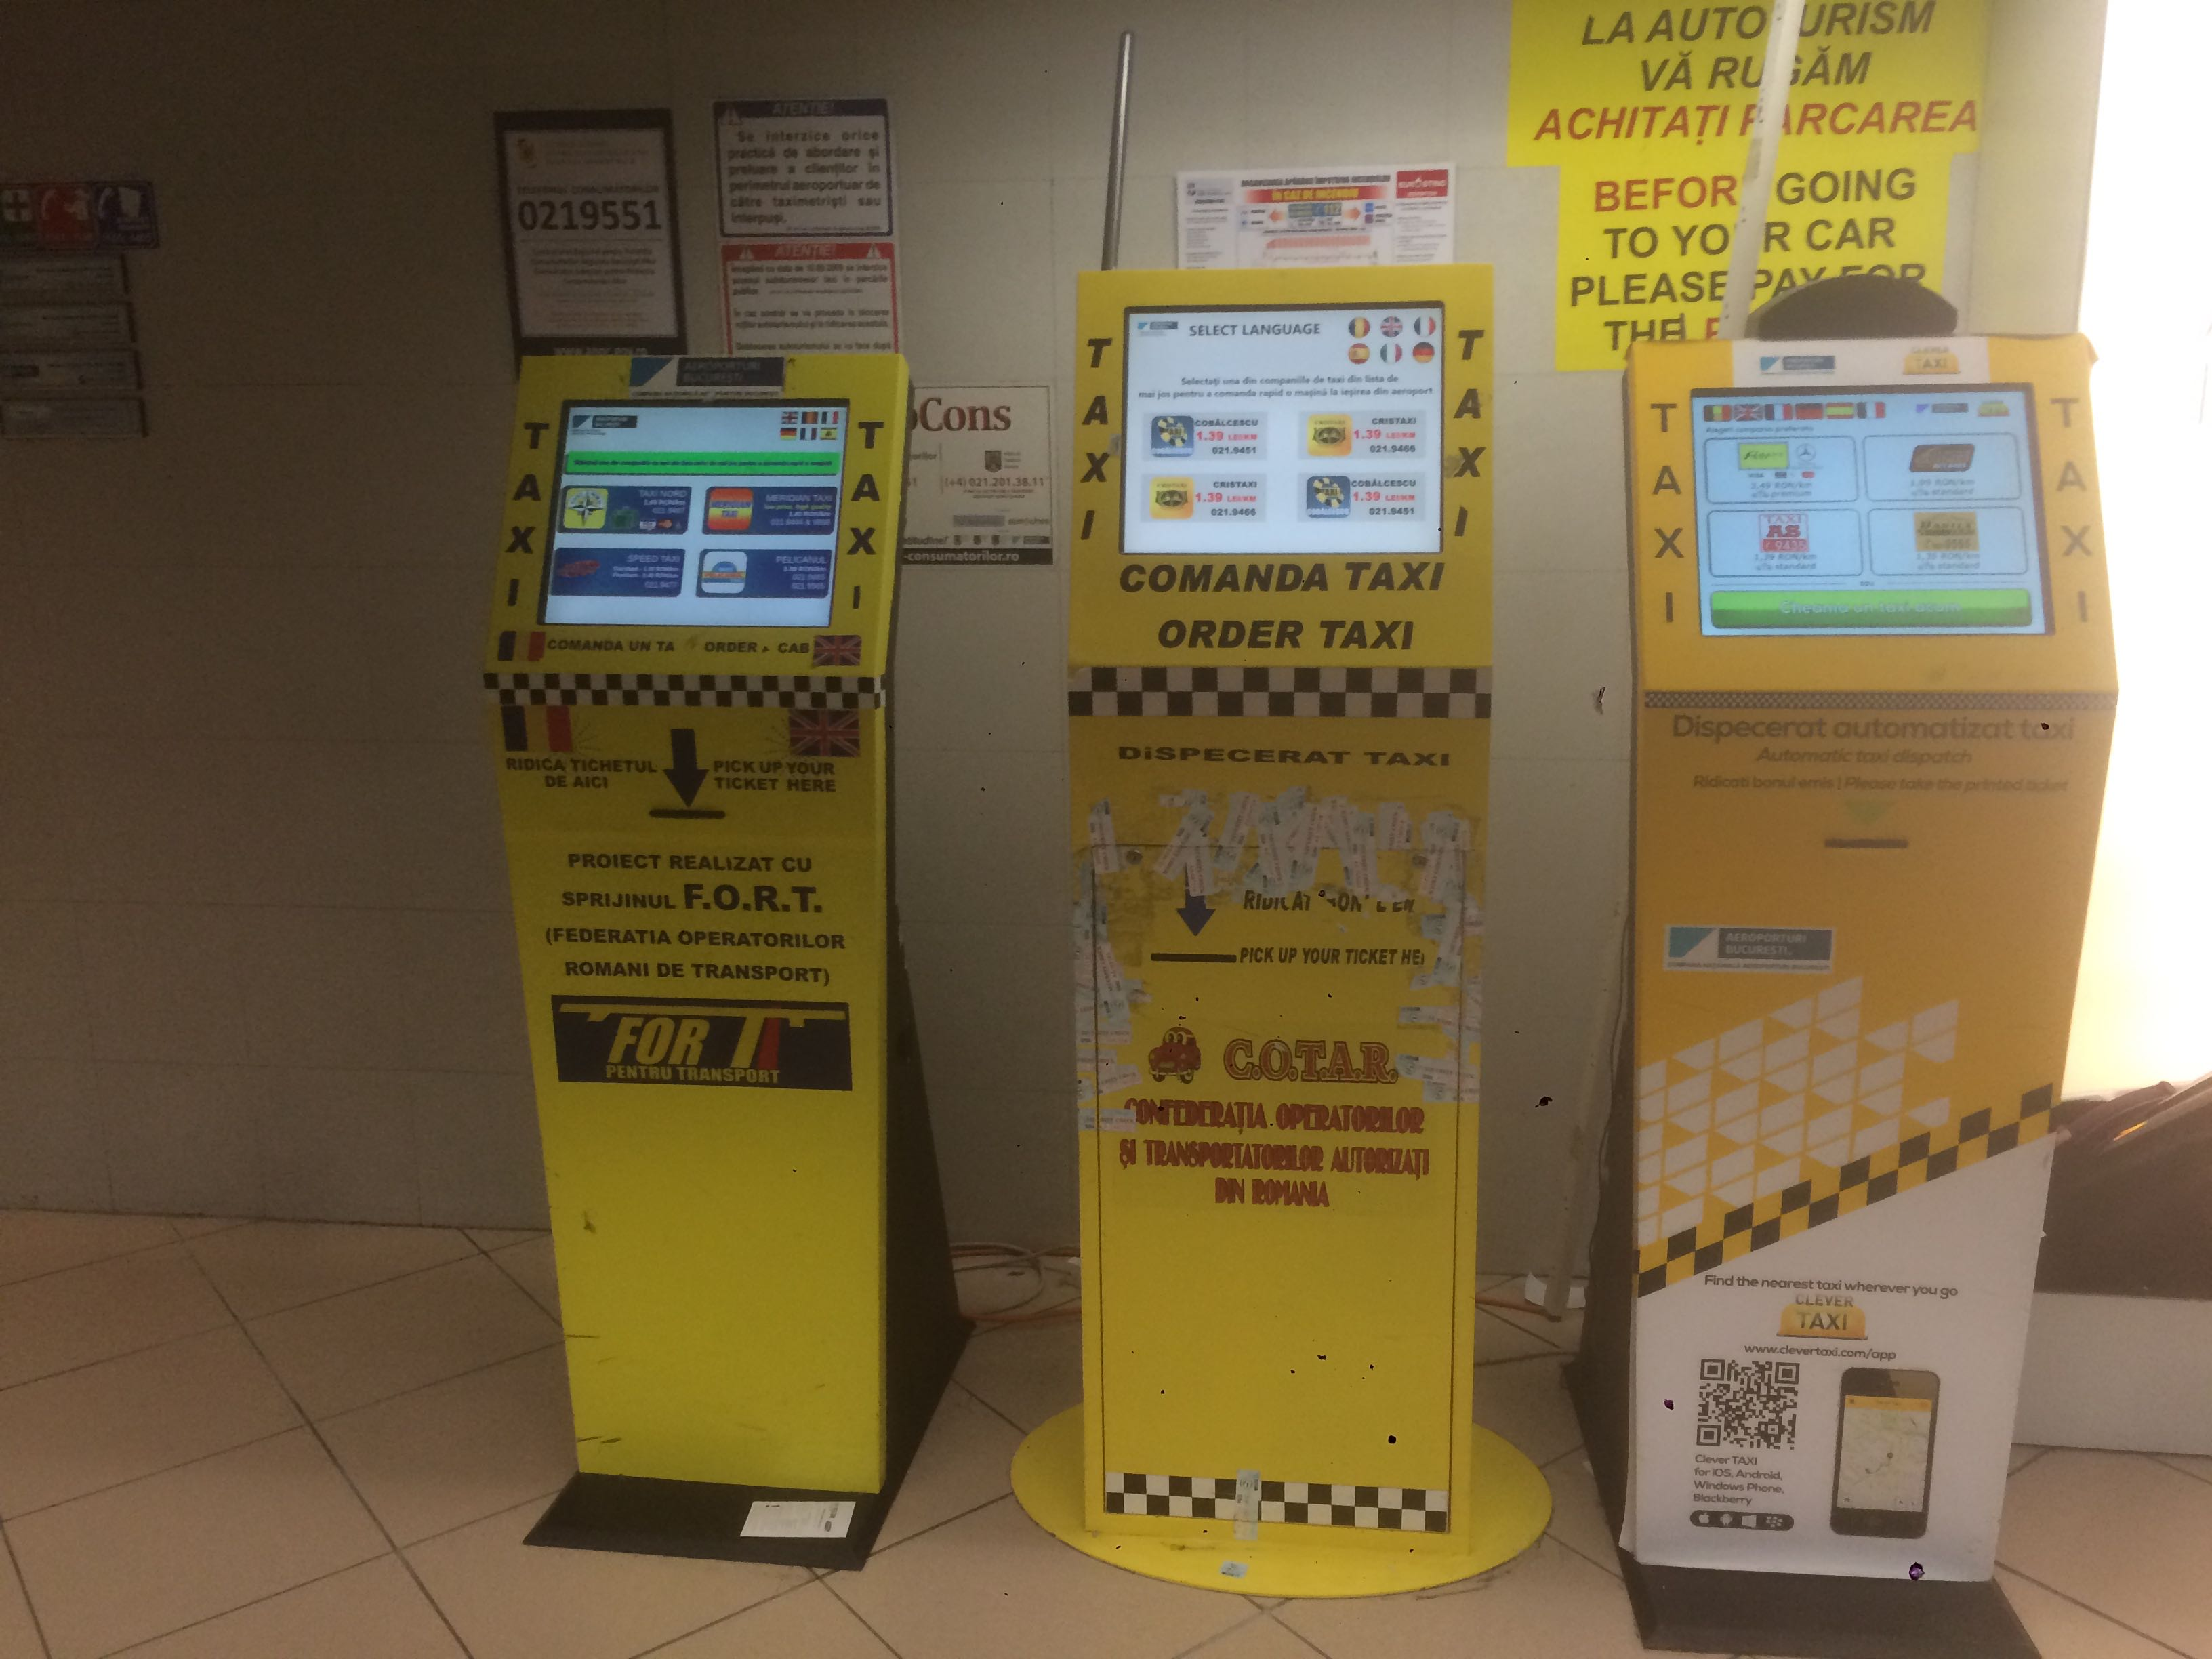 Aeroporto Bucarest : Romania aeroporto bucarest henri conda otp